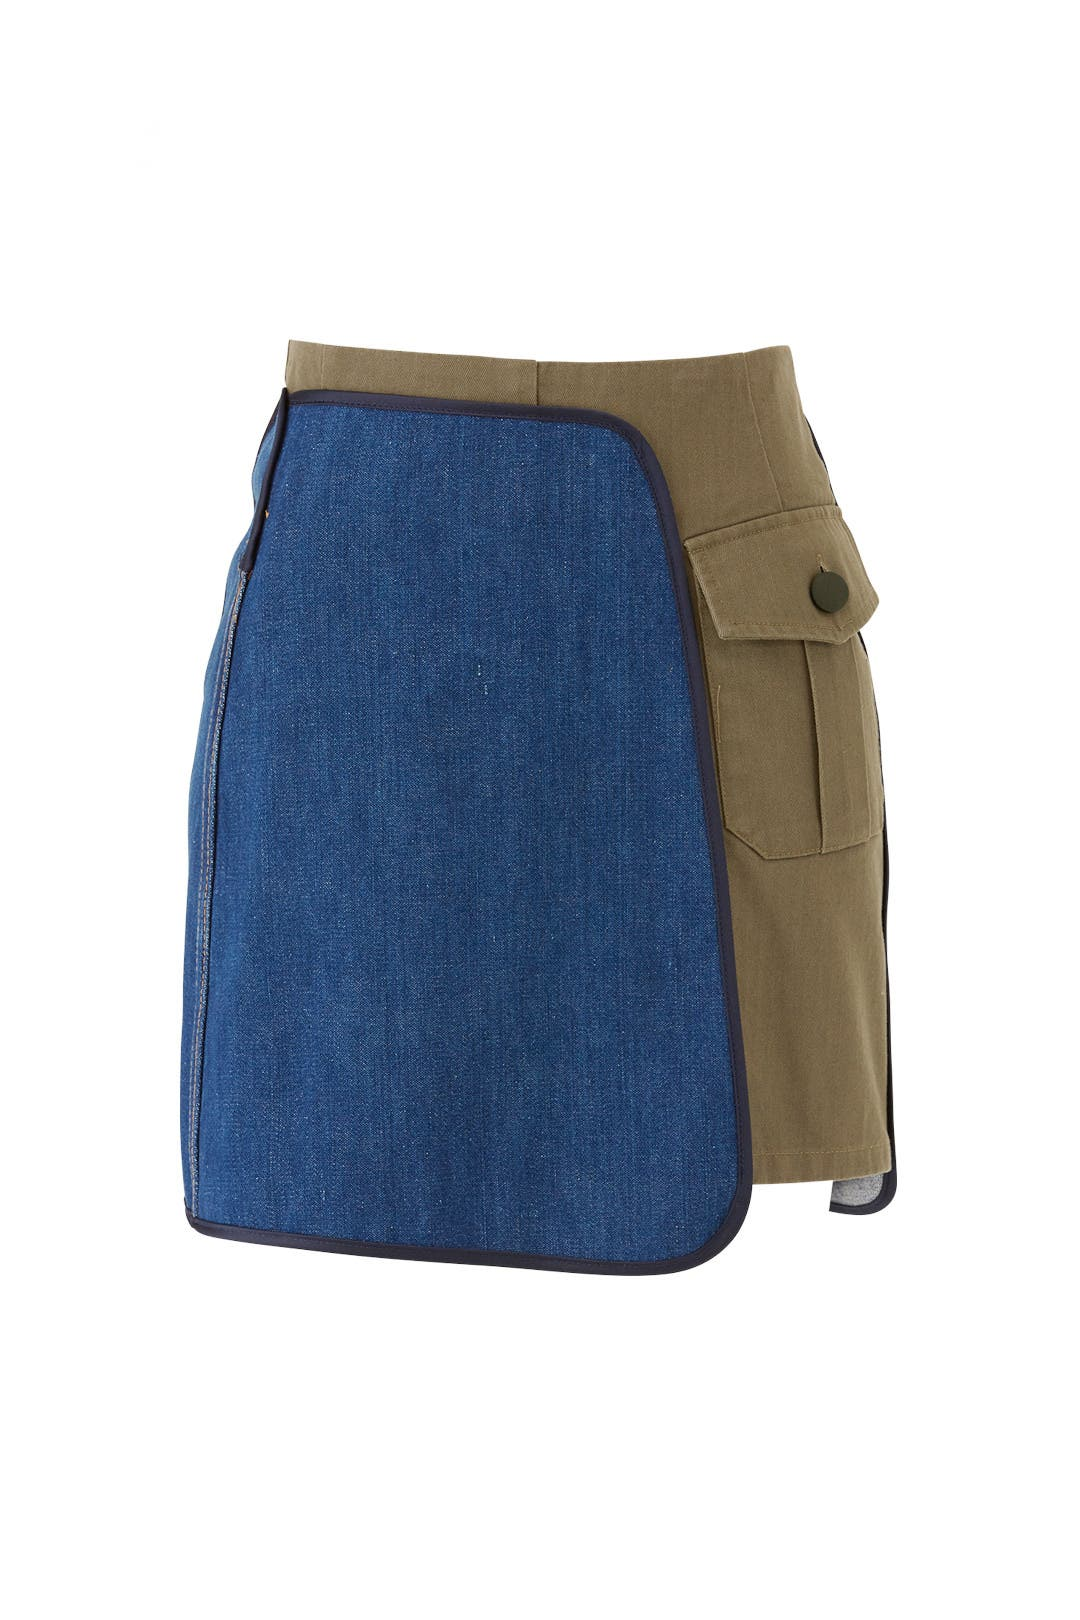 0a2db4b4b5333 Vintage Denim Hybrid Skirt by Harvey Faircloth for $75 | Rent the Runway